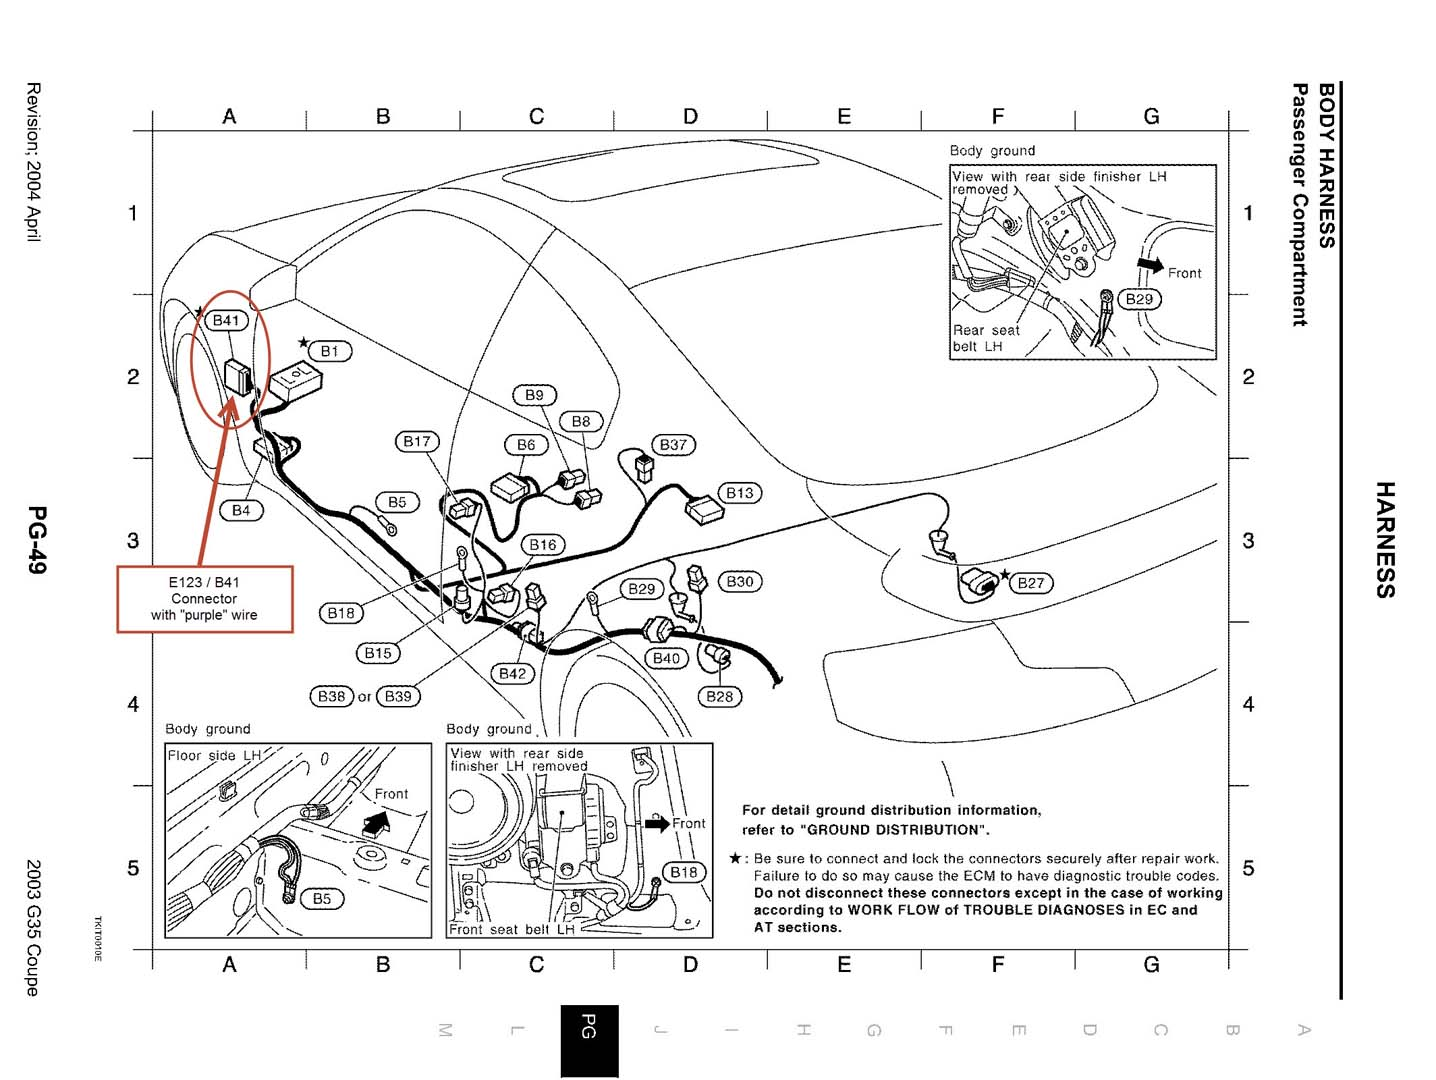 2005 infiniti fx35 wiring diagram